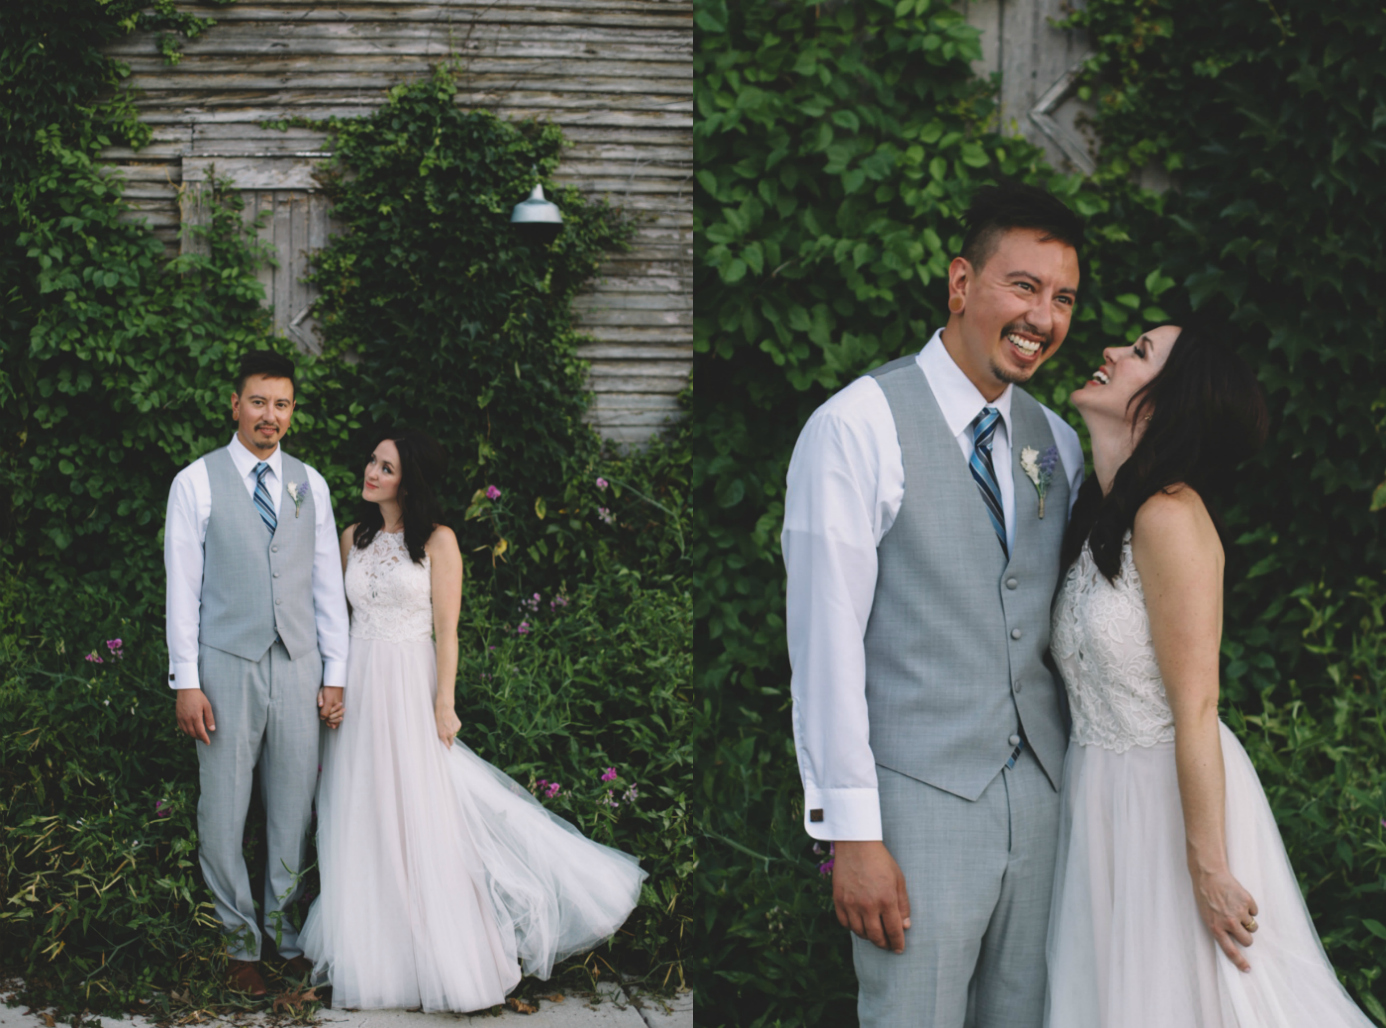 Indiana Bride and Groom.jpg